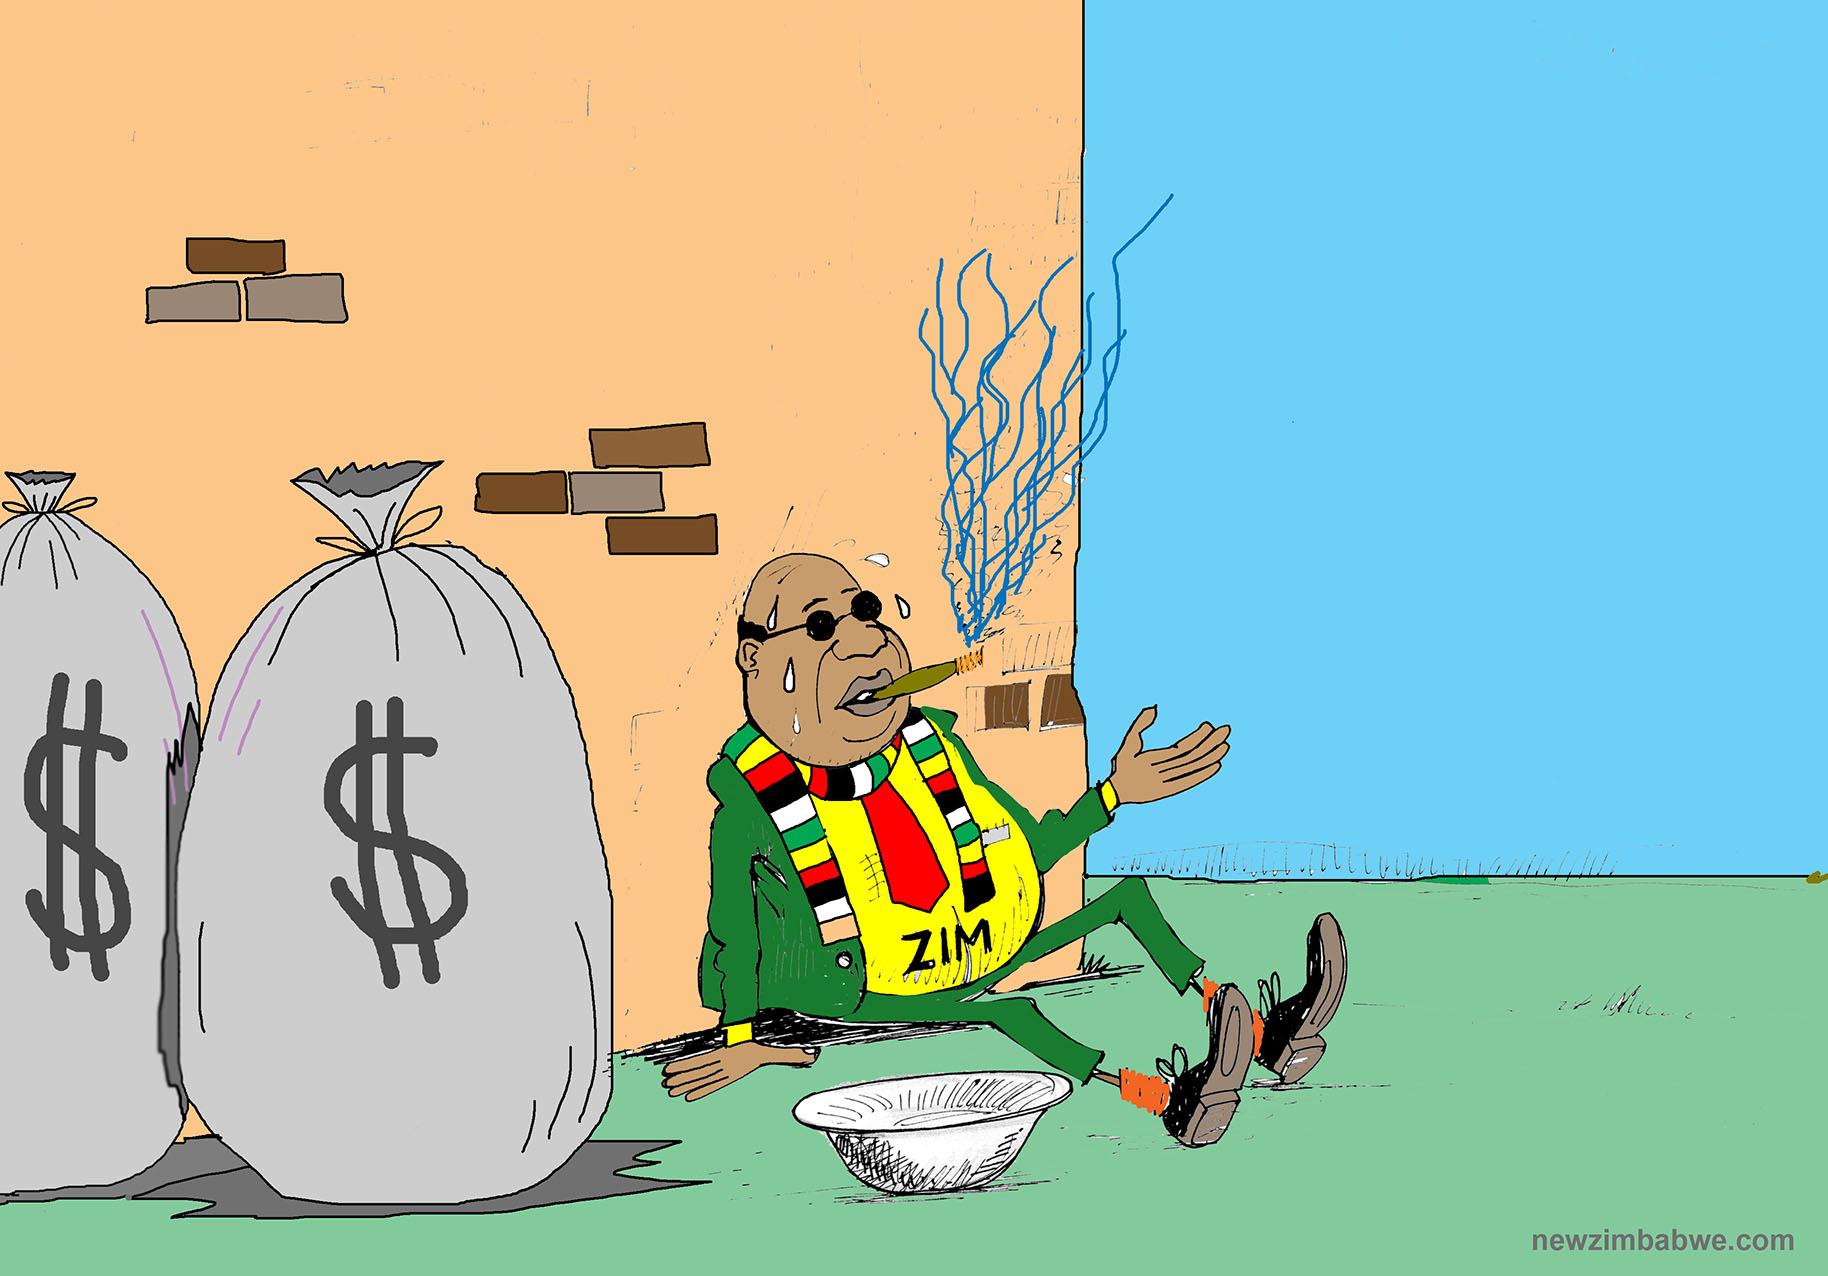 Whither now Zimbabwe